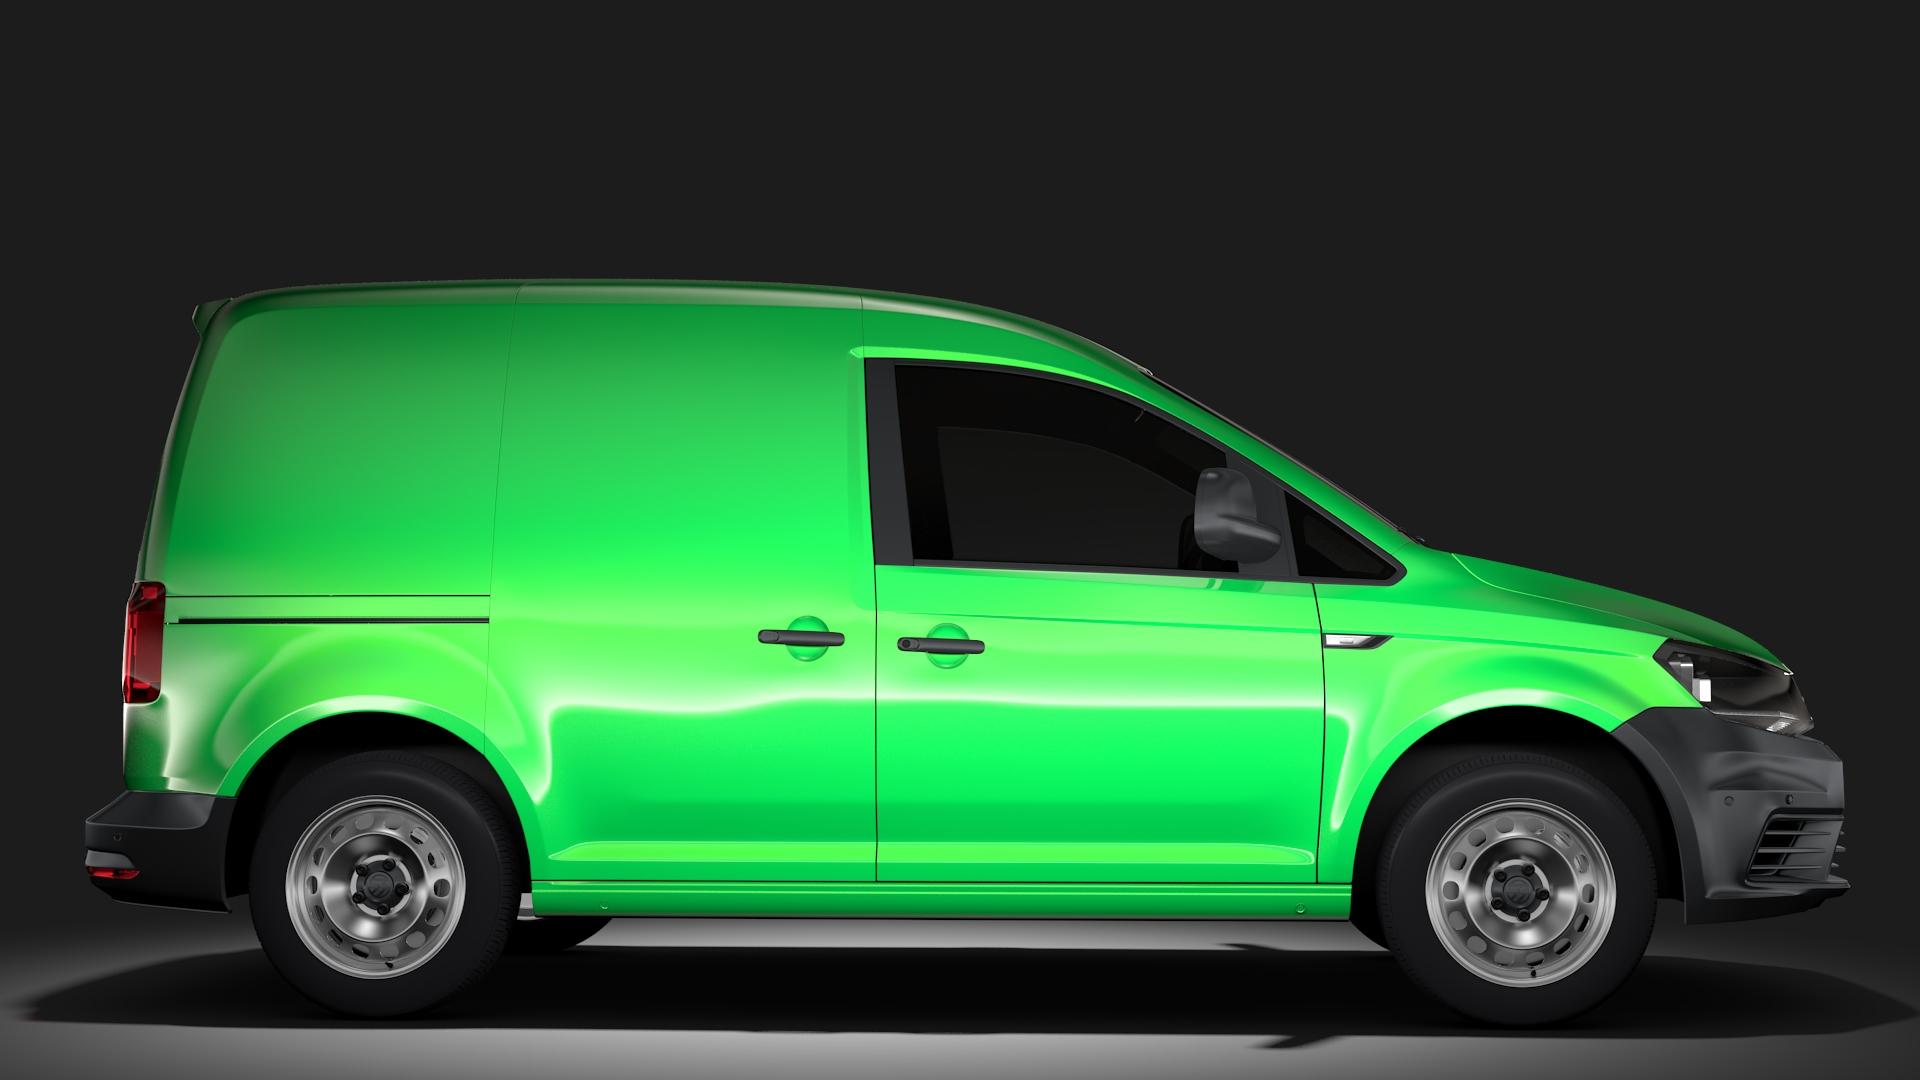 volkswagen caddy panel van l1 2017 3d model. Black Bedroom Furniture Sets. Home Design Ideas